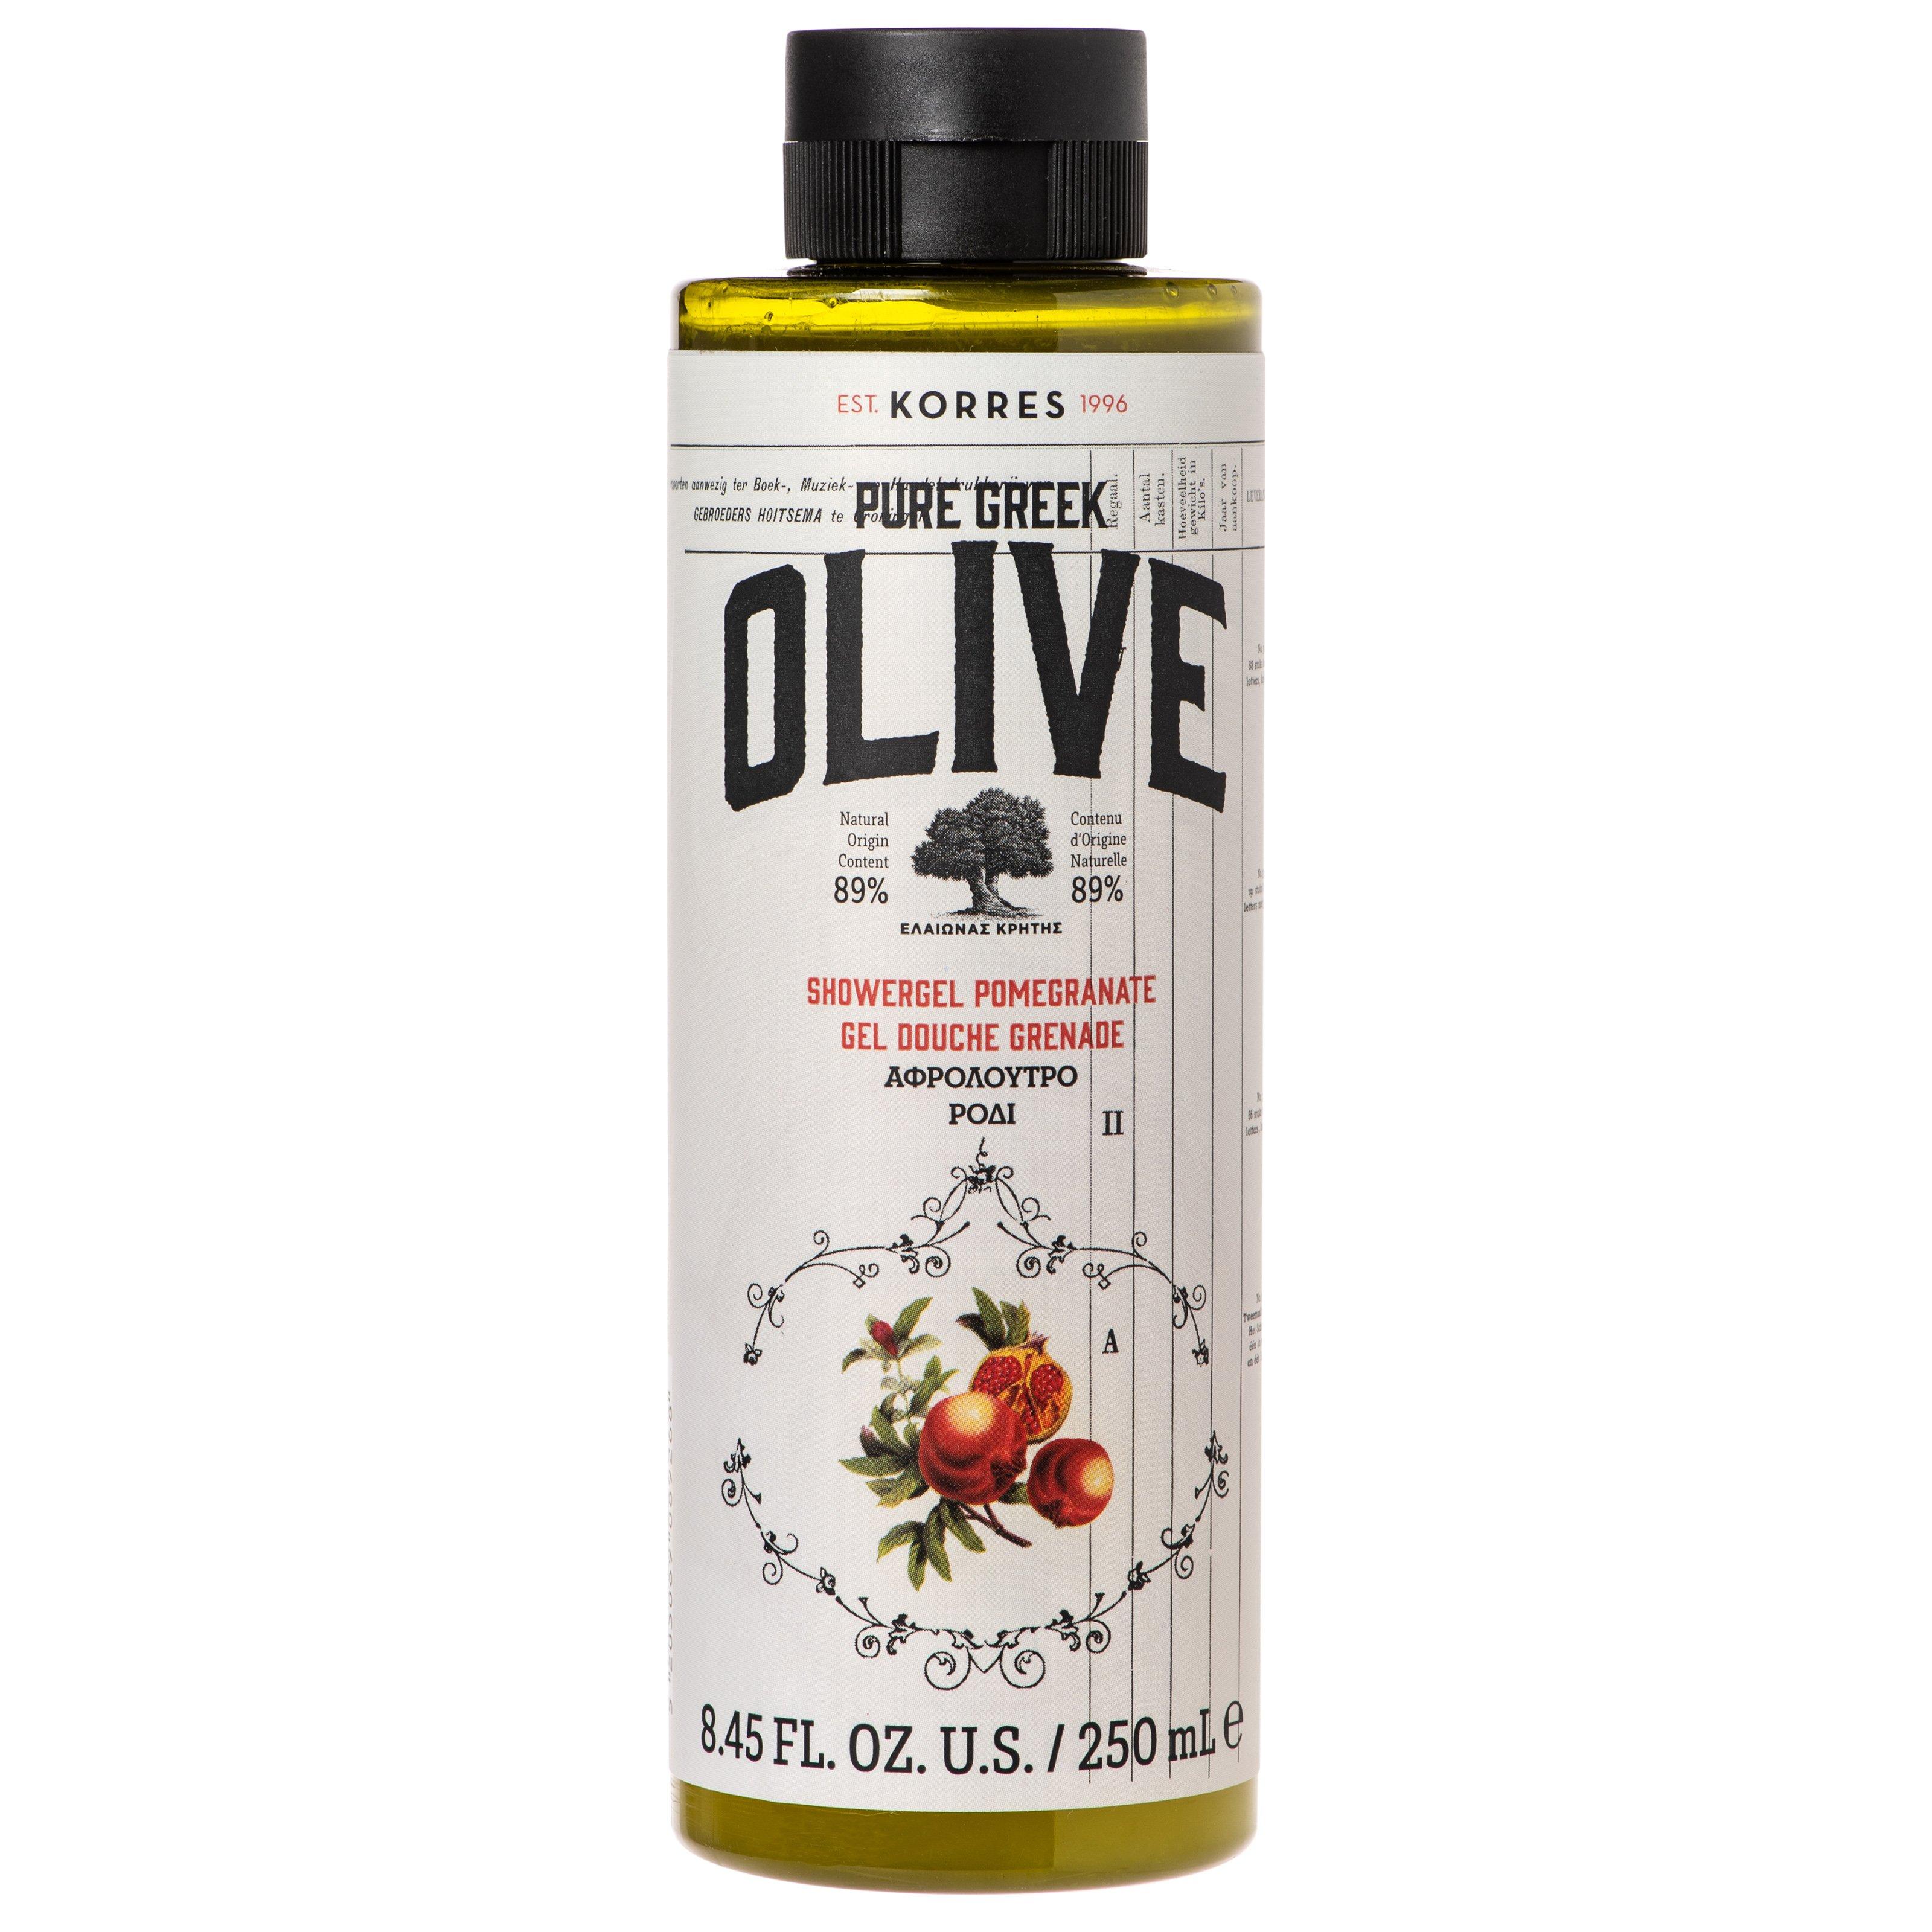 Korres Pure Greek Olive Showergel Pomegranate Τονωτικό Αφρόλουτρο με Εξαιρετικό Παρθένο Ελαιόλαδο & Άρωμα Ρόδι 250ml